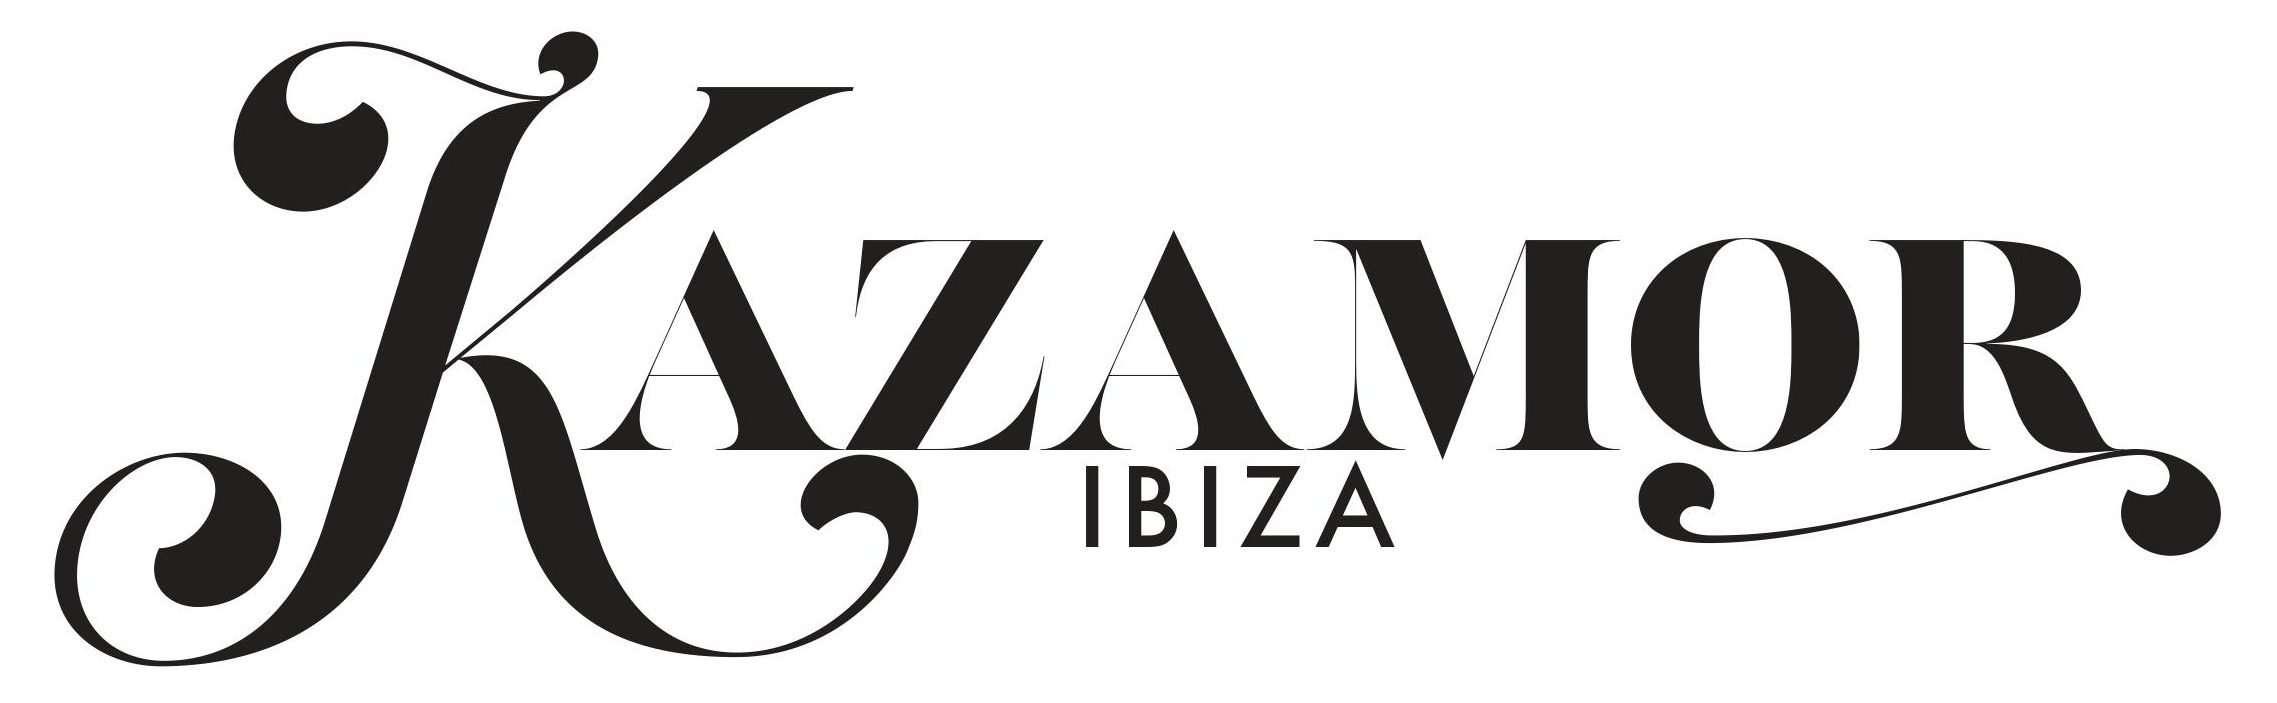 Kazamor Ibiza